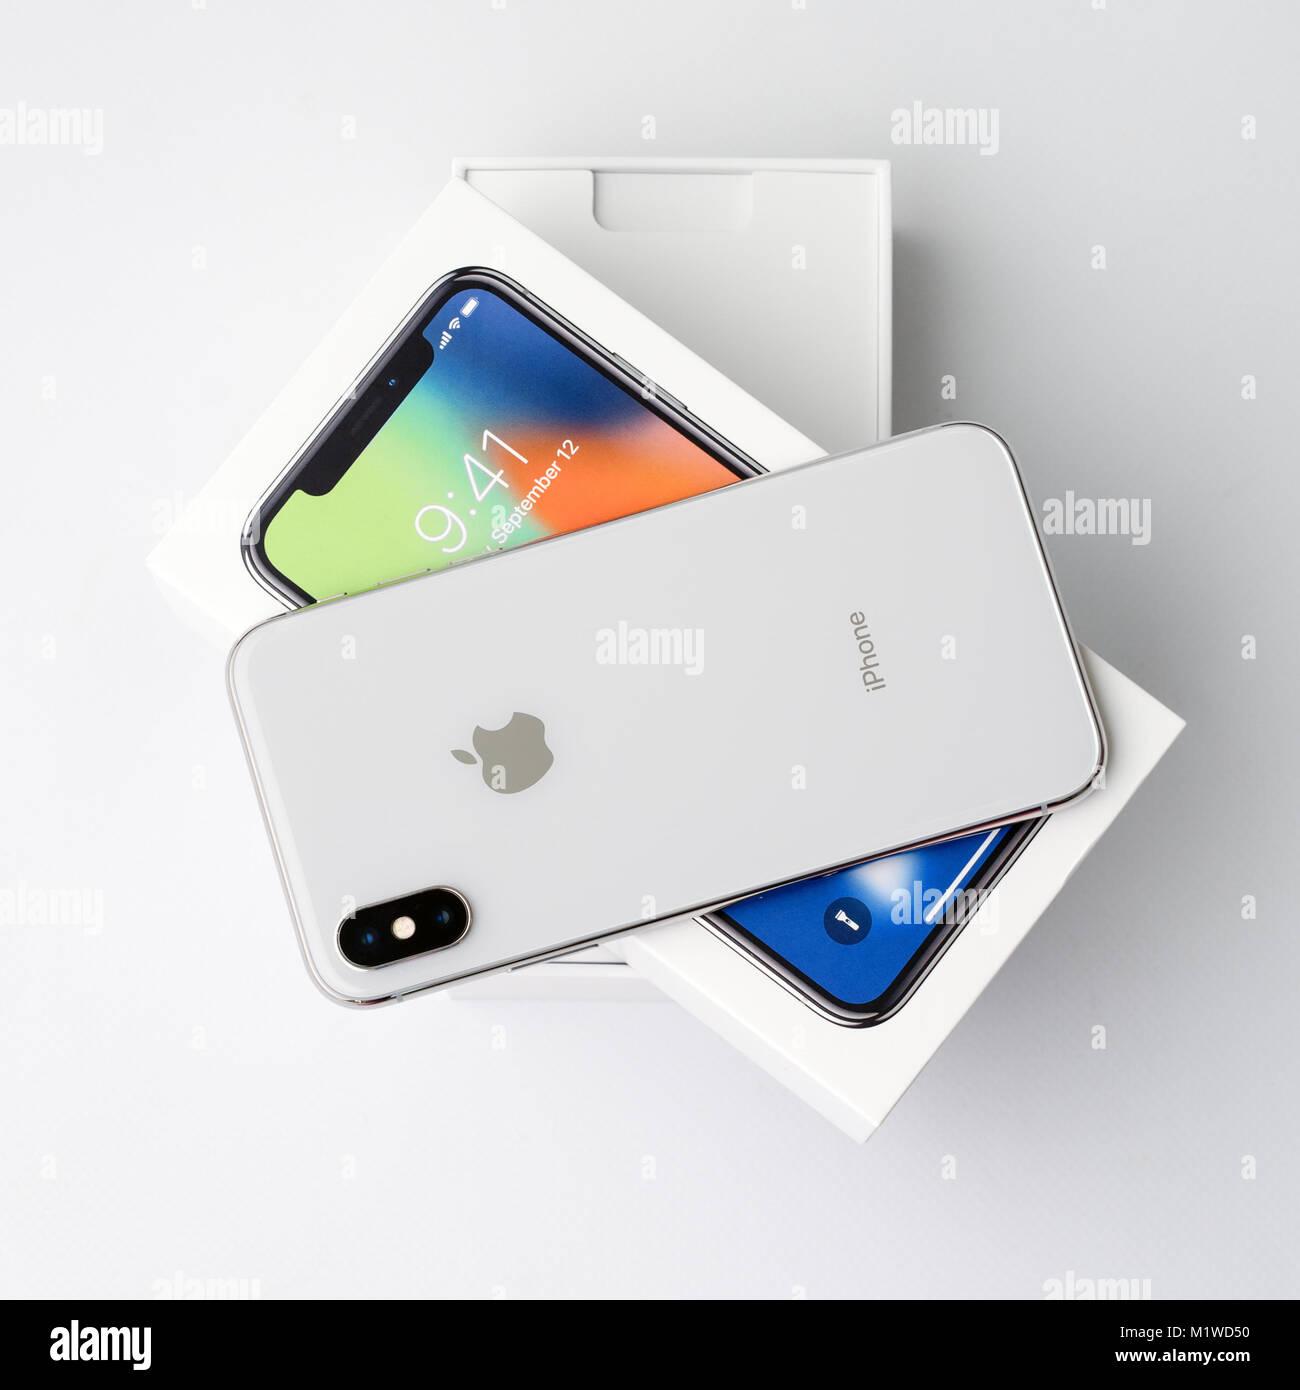 Kyiv Ukraine 26 January 2018 New Iphone X Smartphone Model